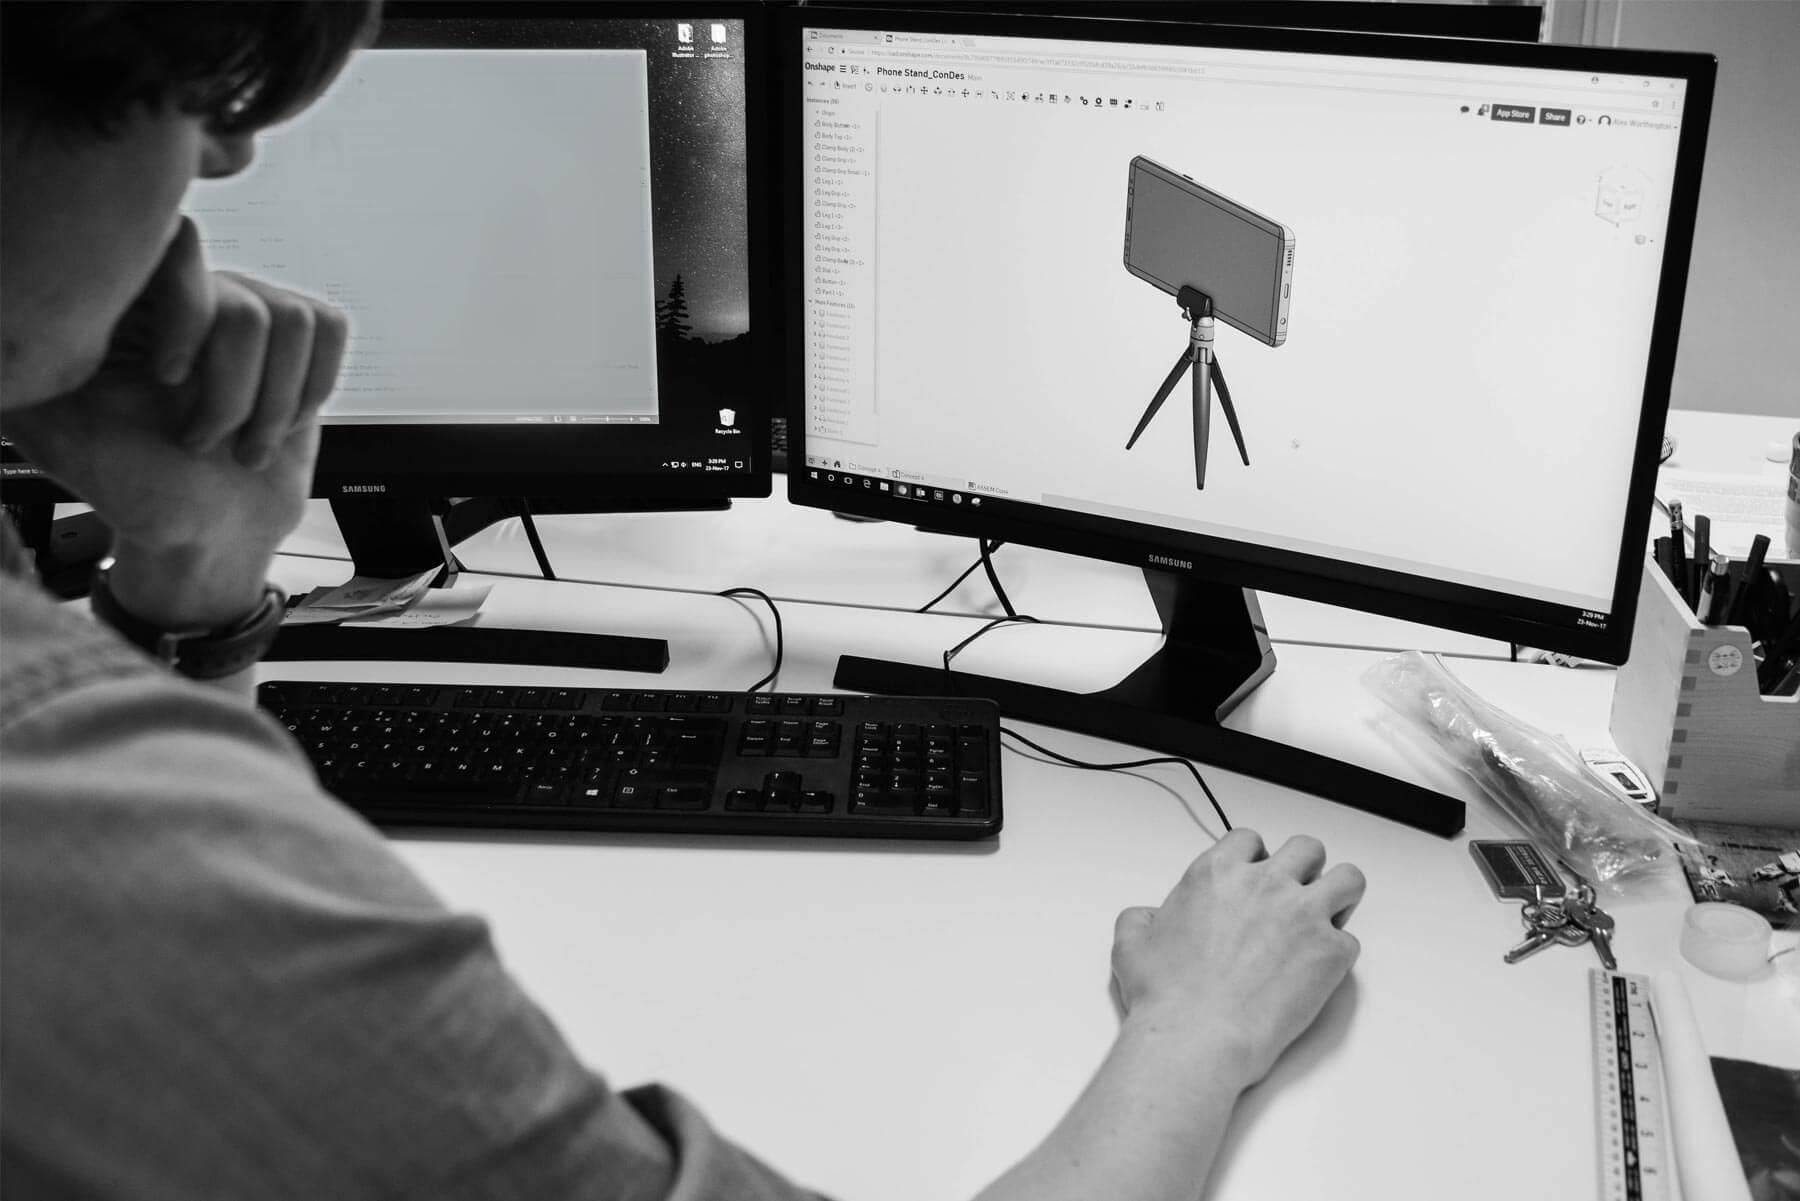 Invention idea product prototype design company